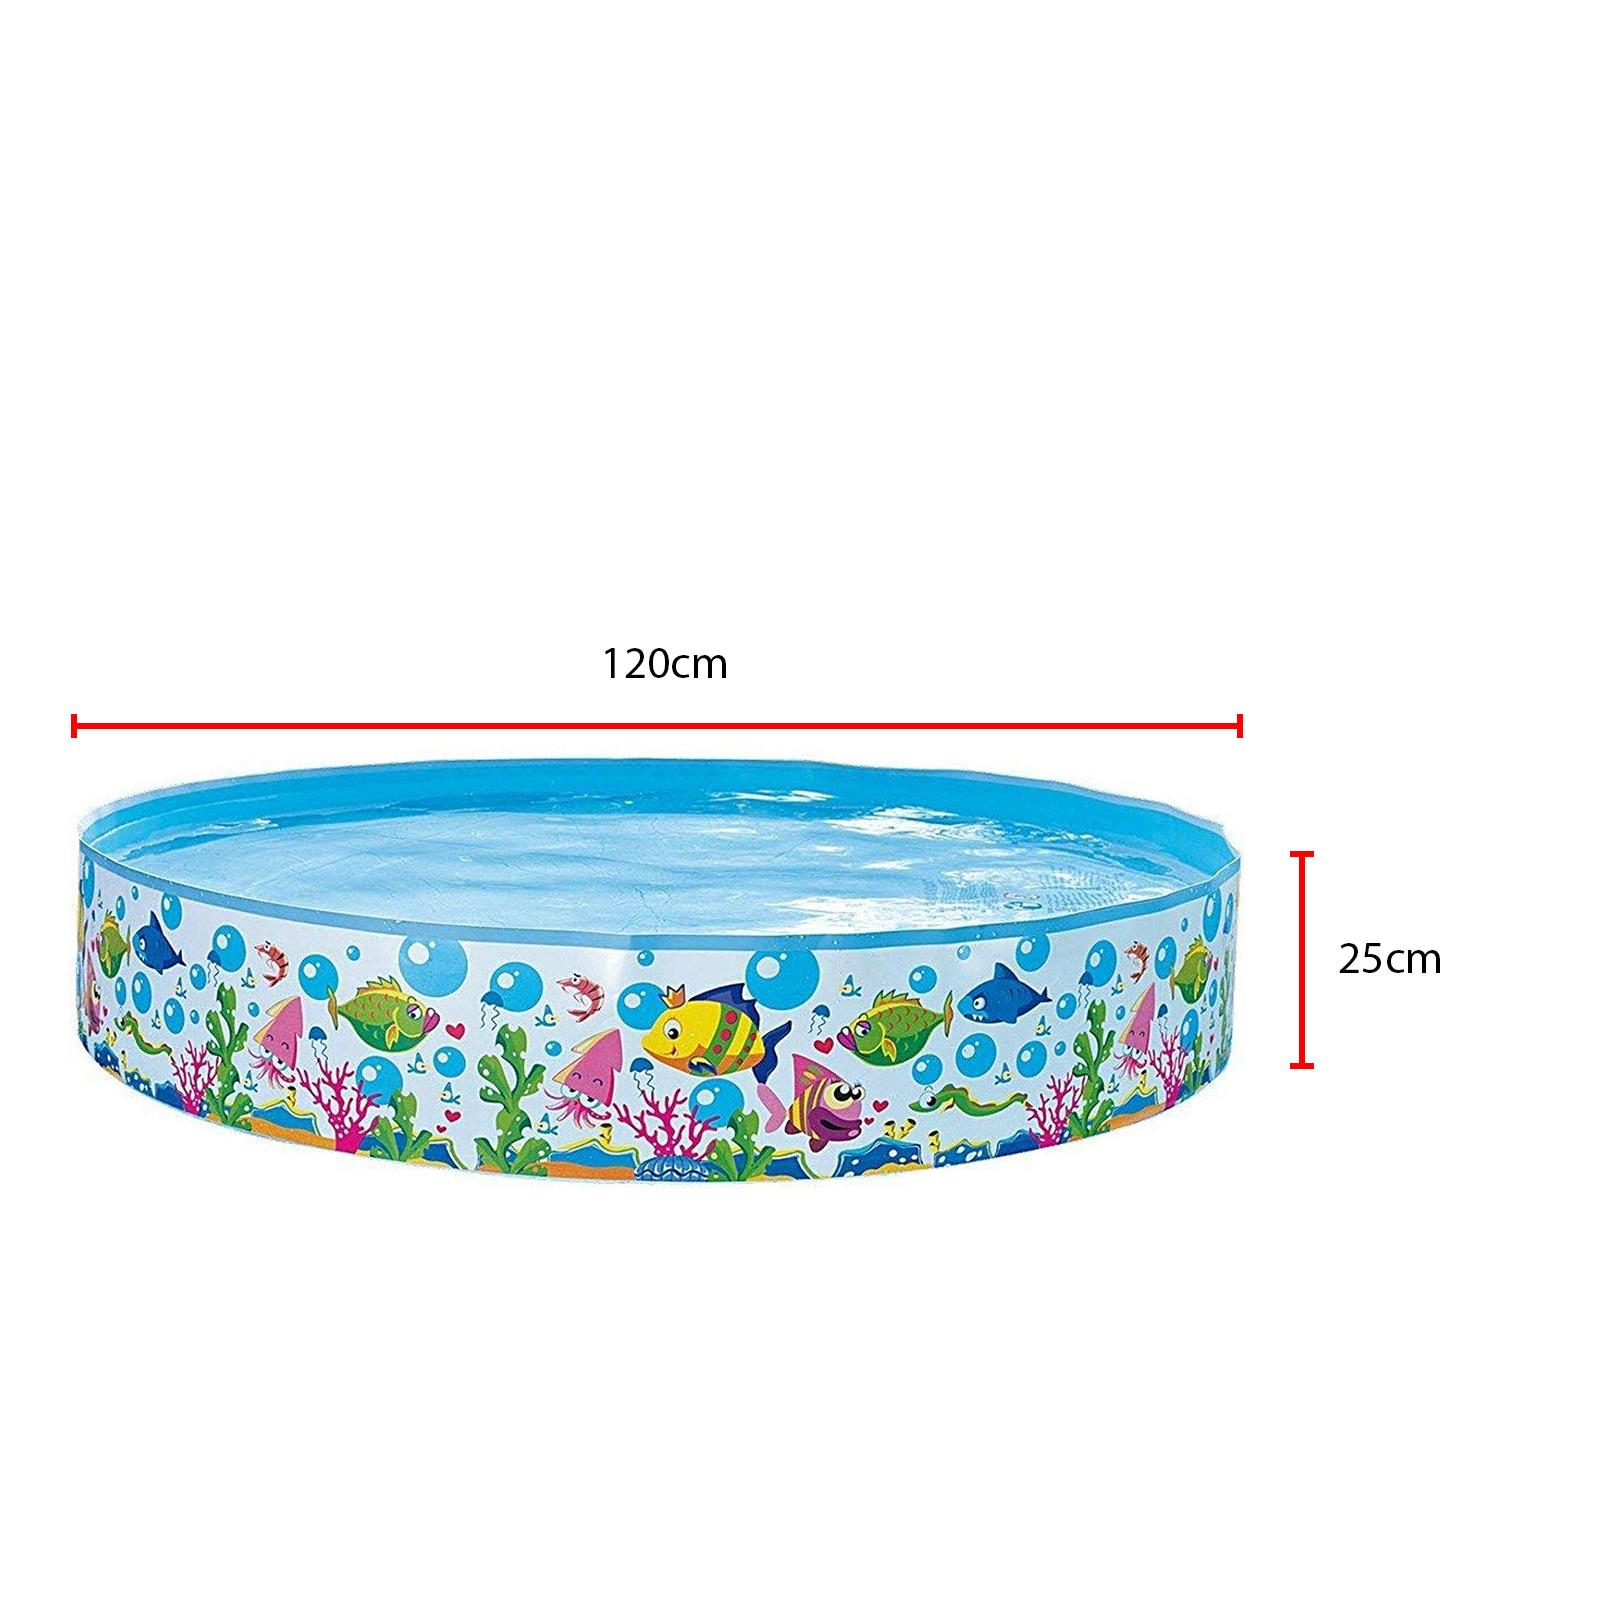 Centro-De-Juegos-De-Natacion-Ninos-Ridgid-Pared-piscina-infantil-Mar-Vida-al-Aire-Libre-diversion miniatura 6